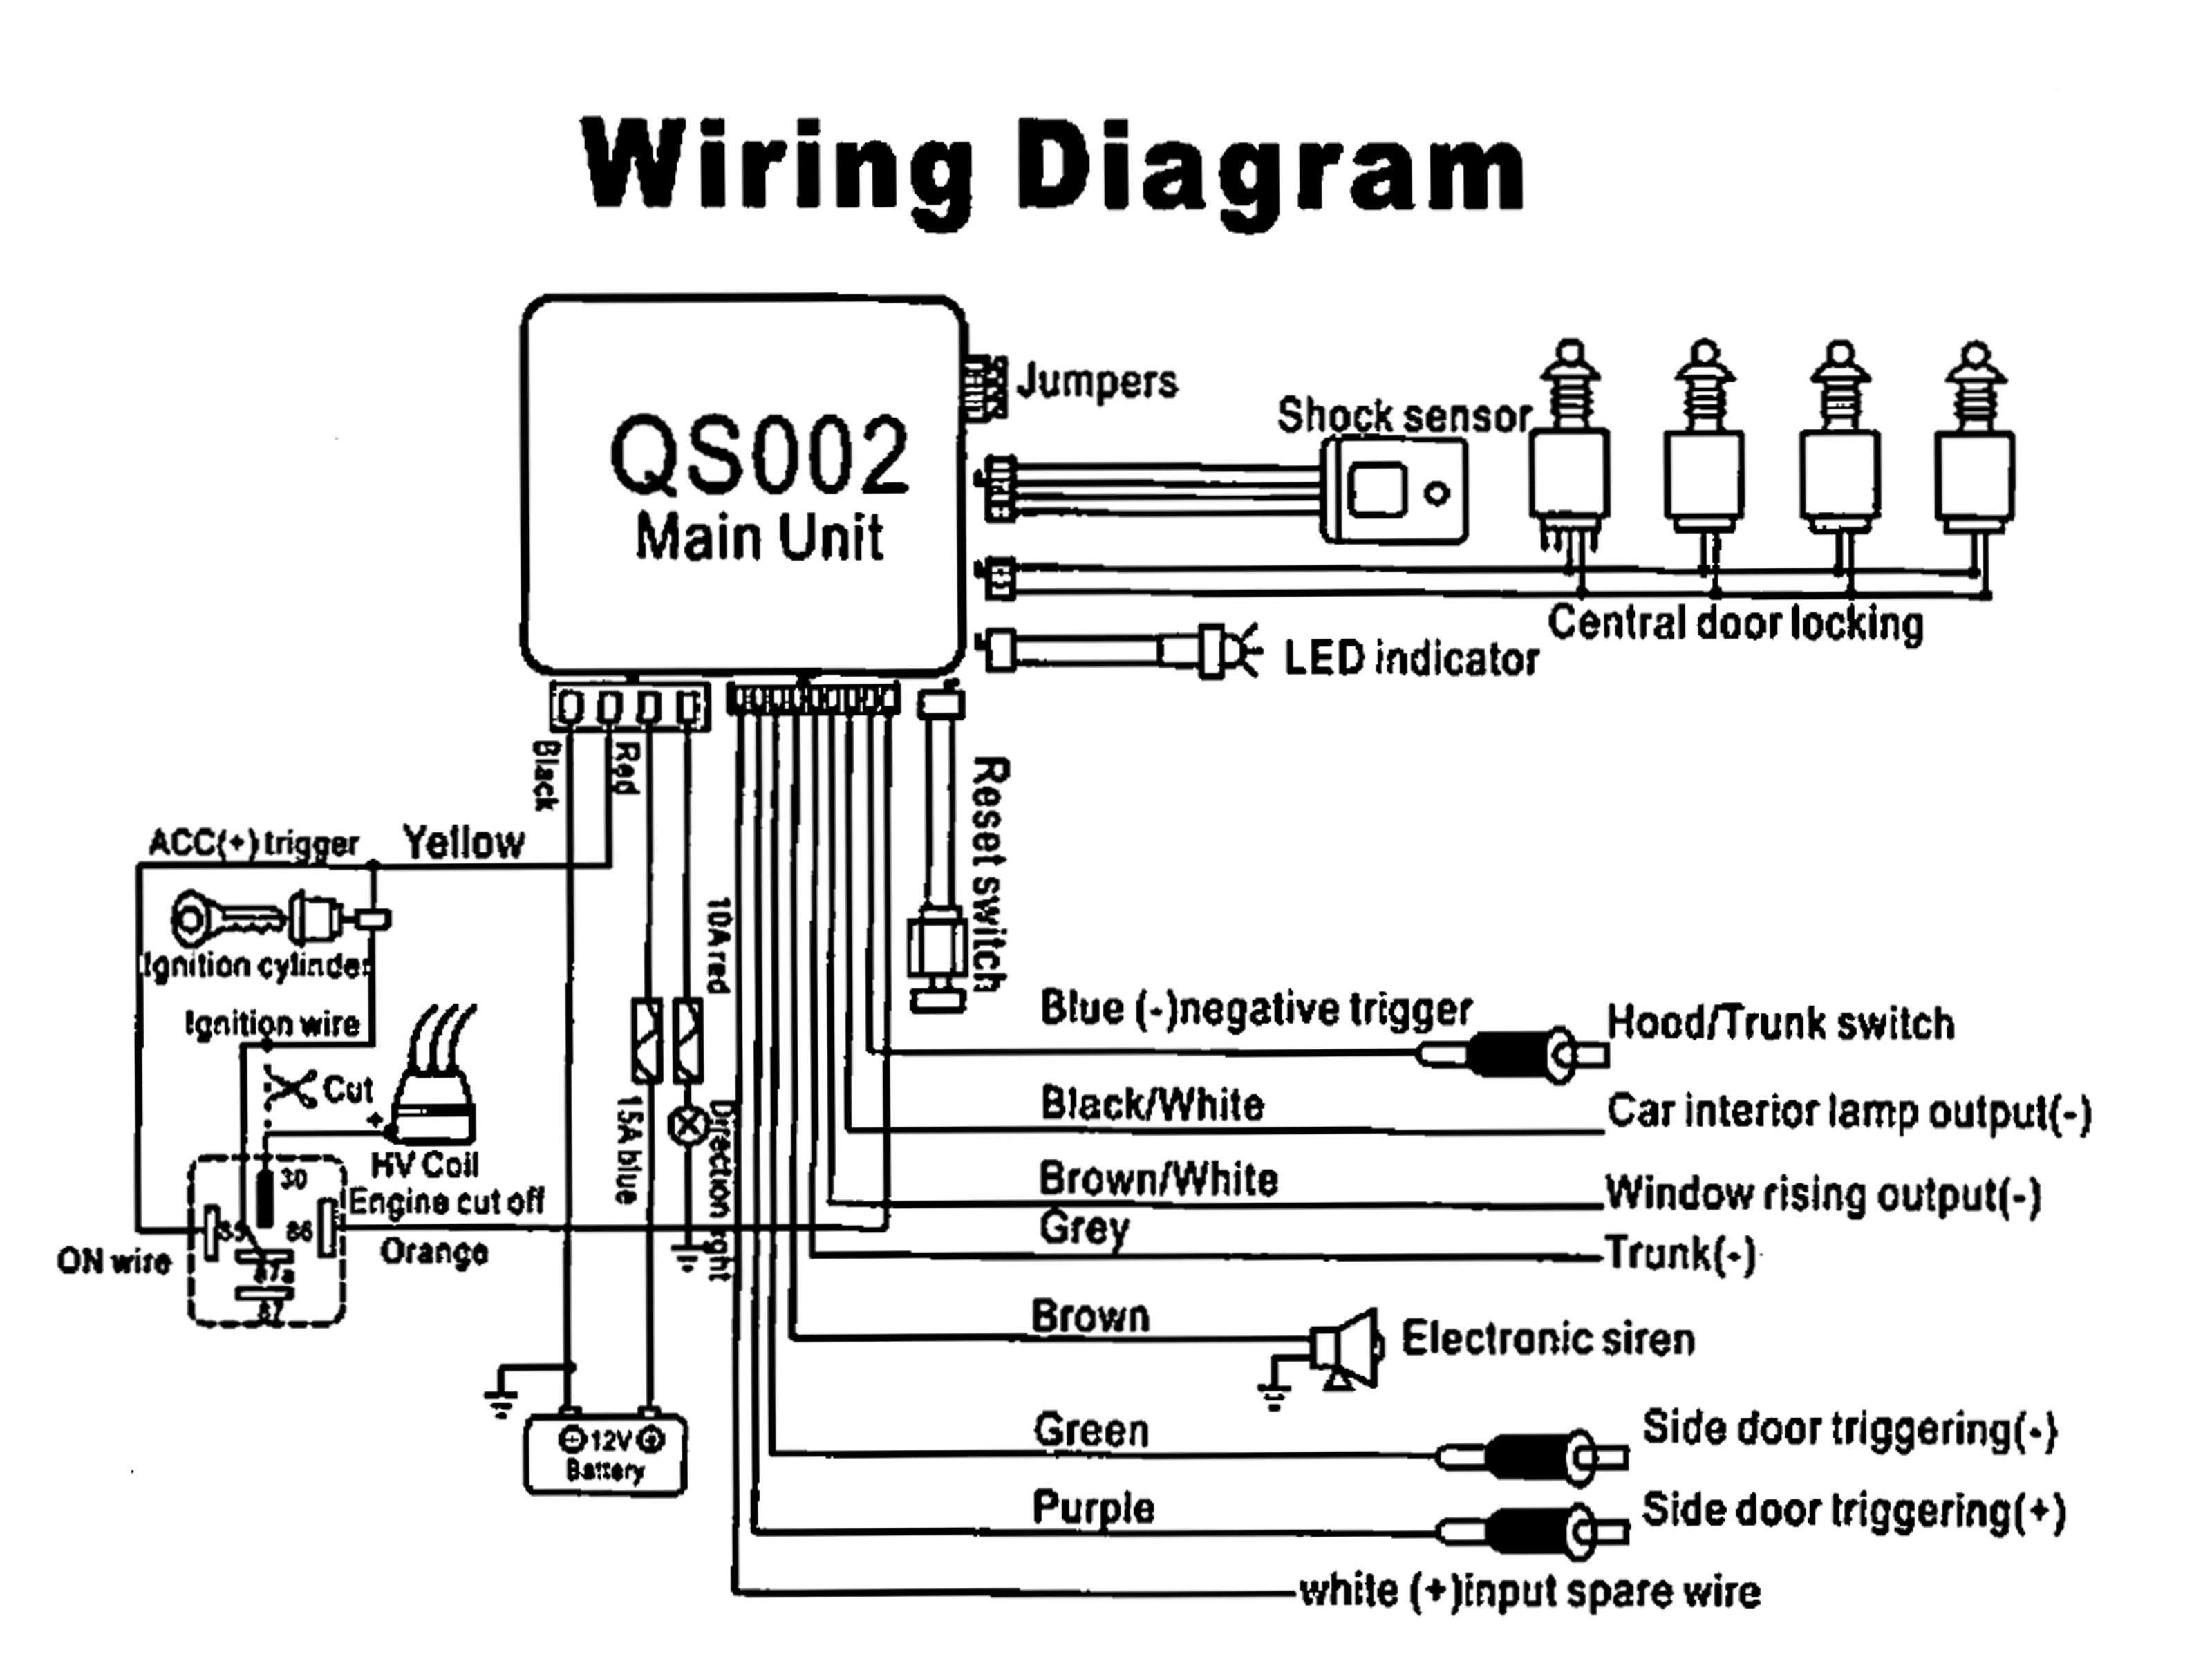 omega car alarm wiring diagrams amazing viper car alarm wiring rh detoxicrecenze com commando alarms car wiring diagrams car alarm wiring diagram software